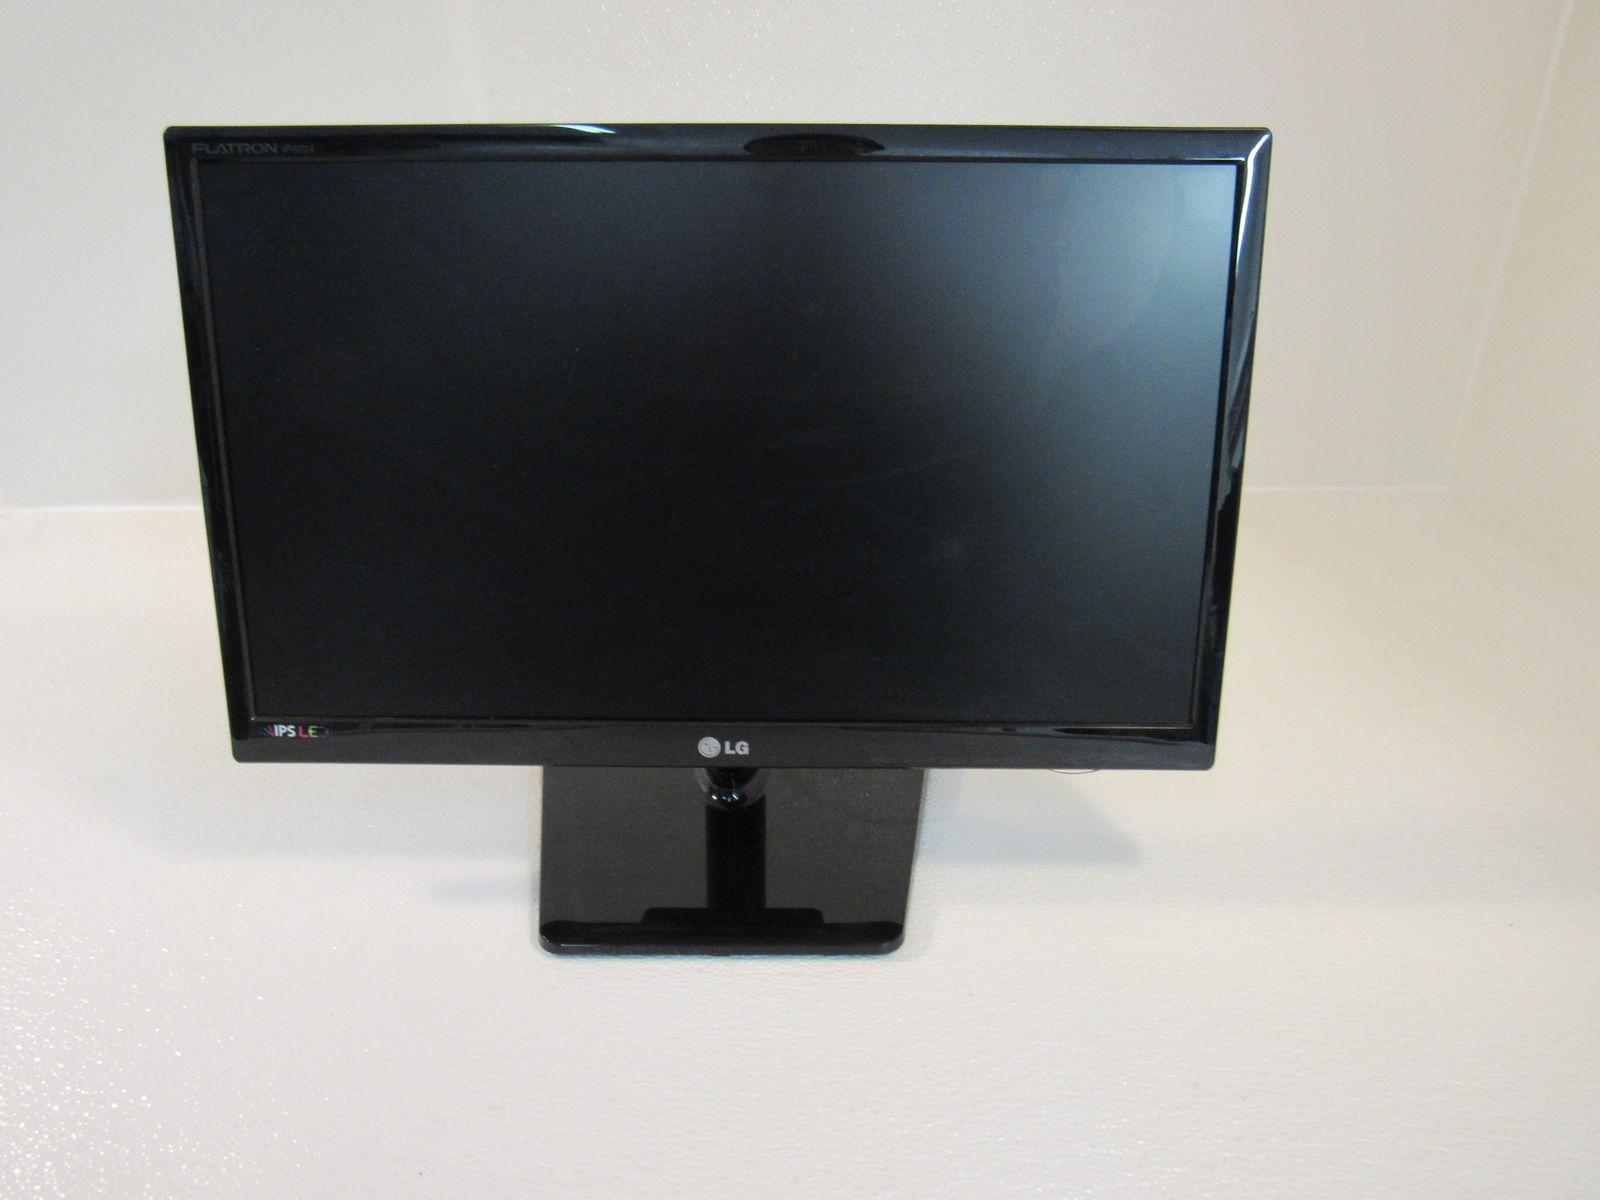 LG Flatron Flat Screen Computer Monitor Black 22in Backlit LED IPS224VA